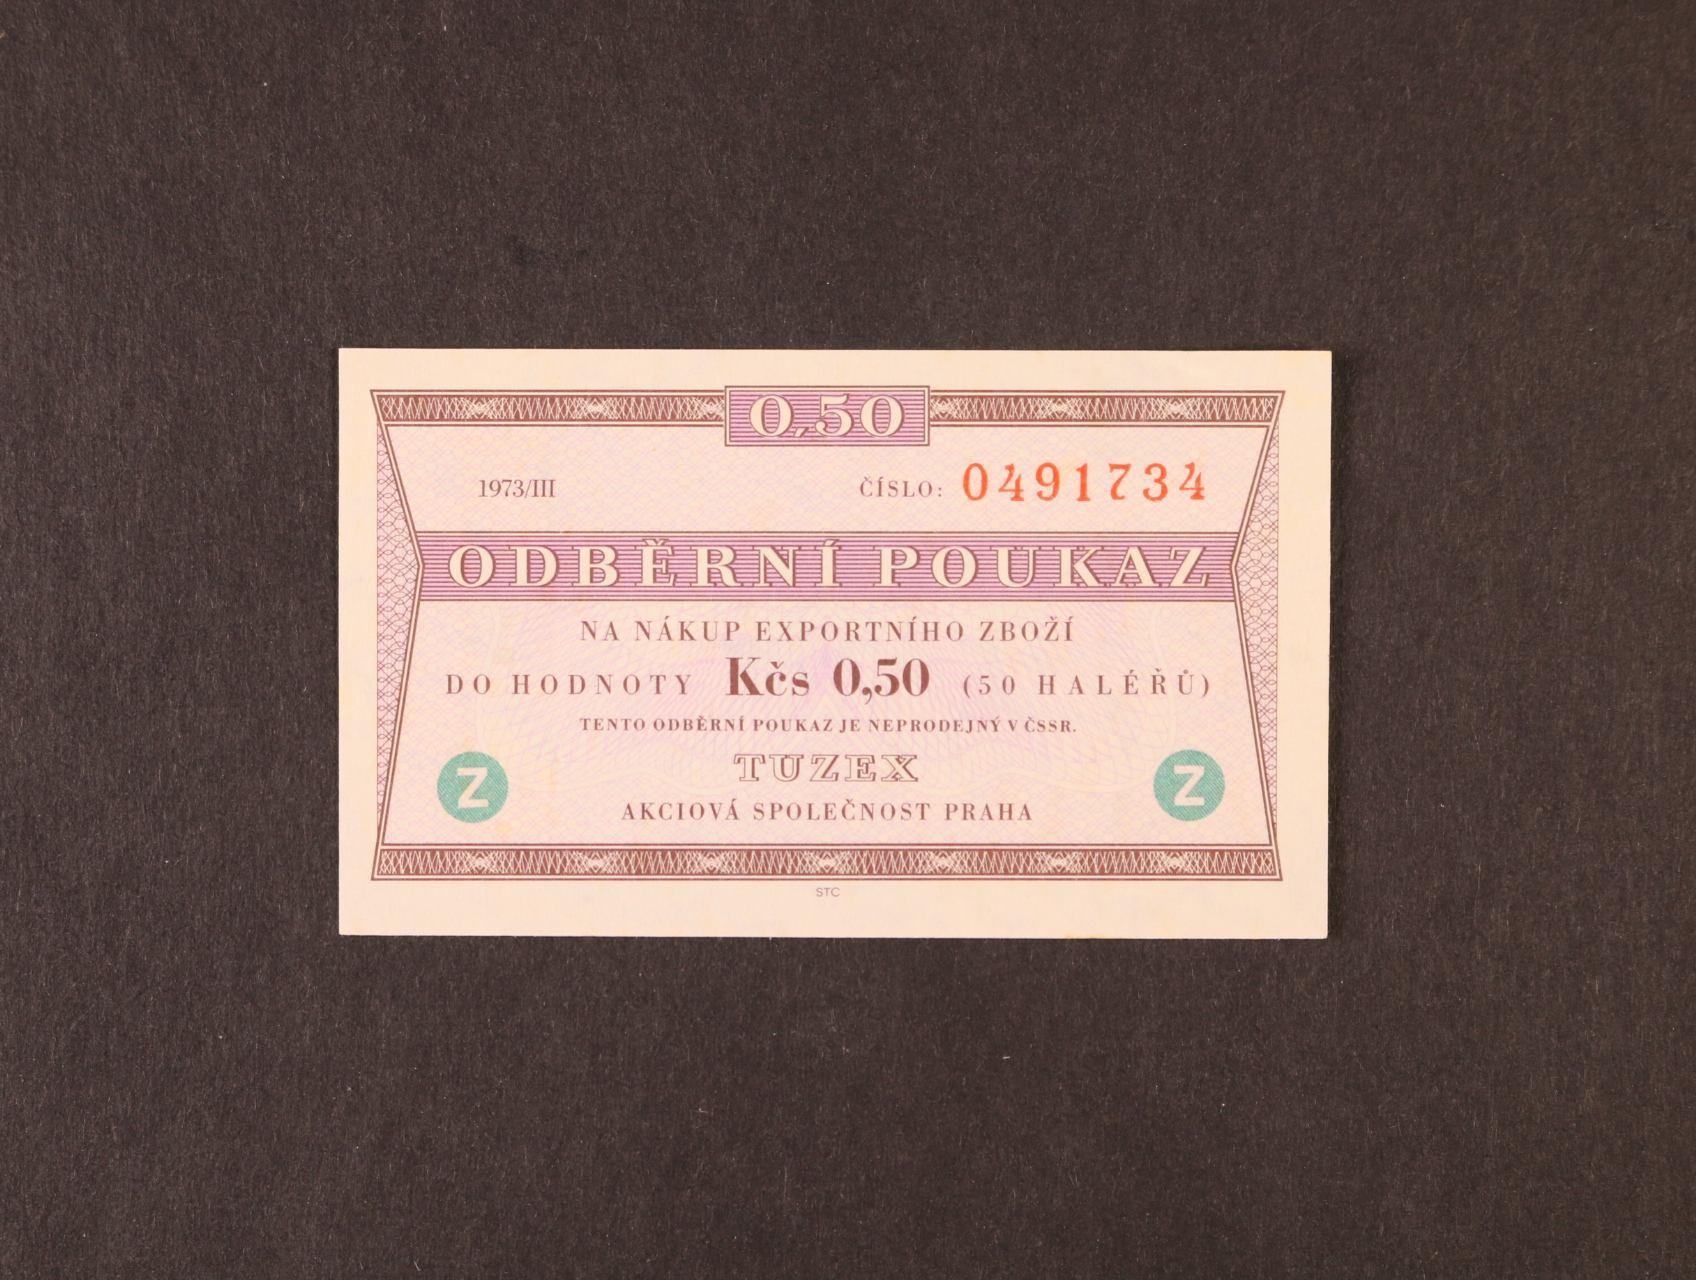 Tuzex, 0,50 TKčs s datem 1973/III